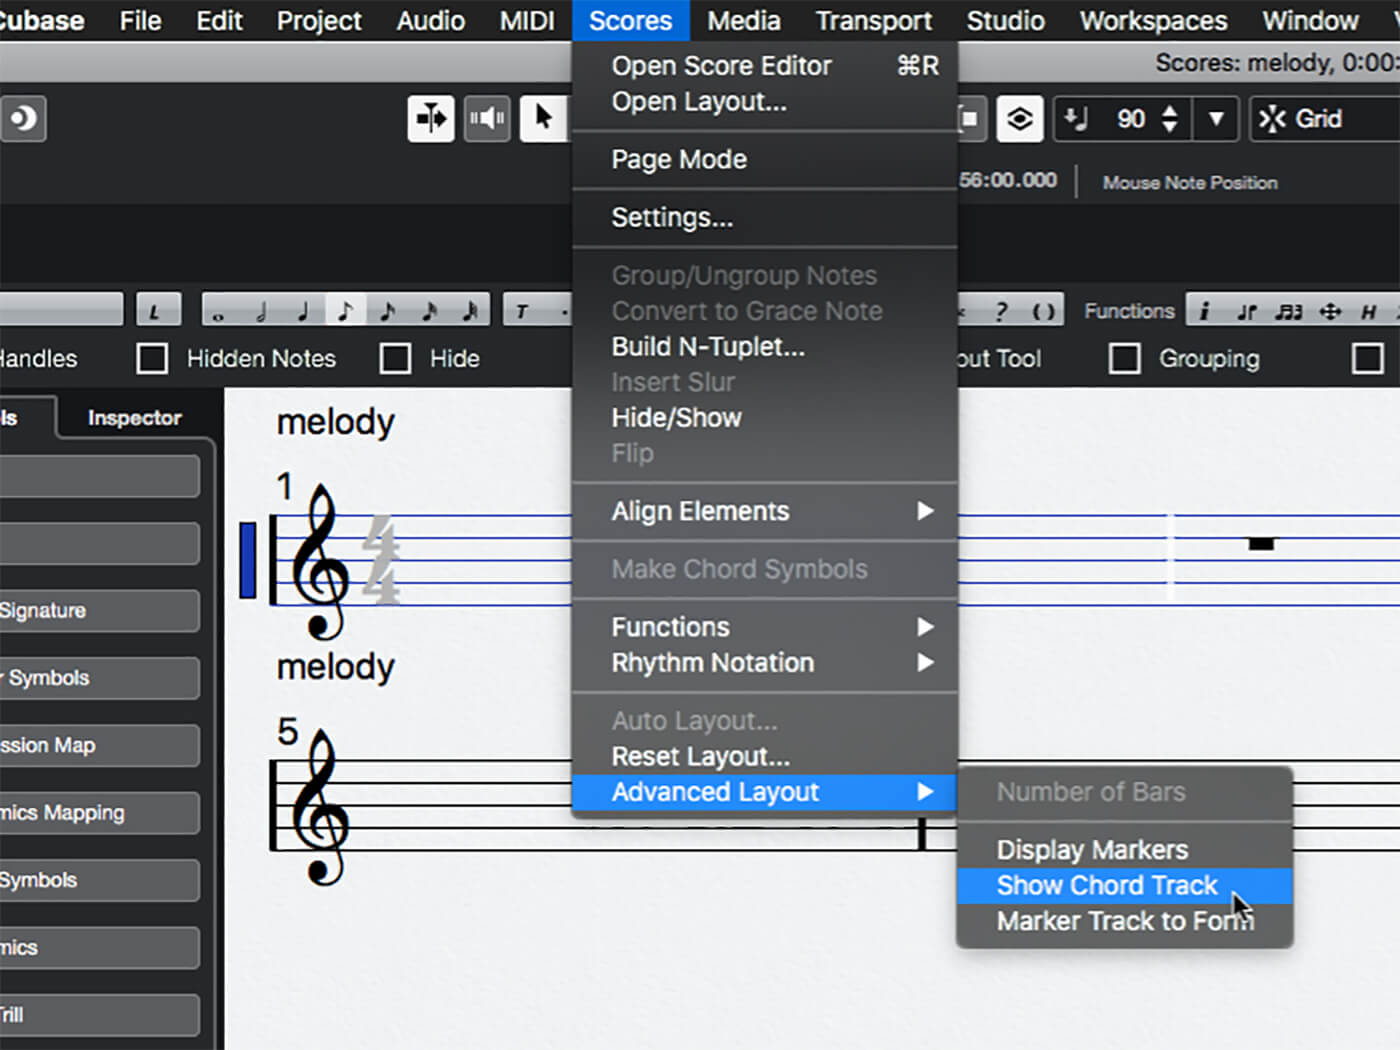 MT 205 Cubase Score Editor Step 7